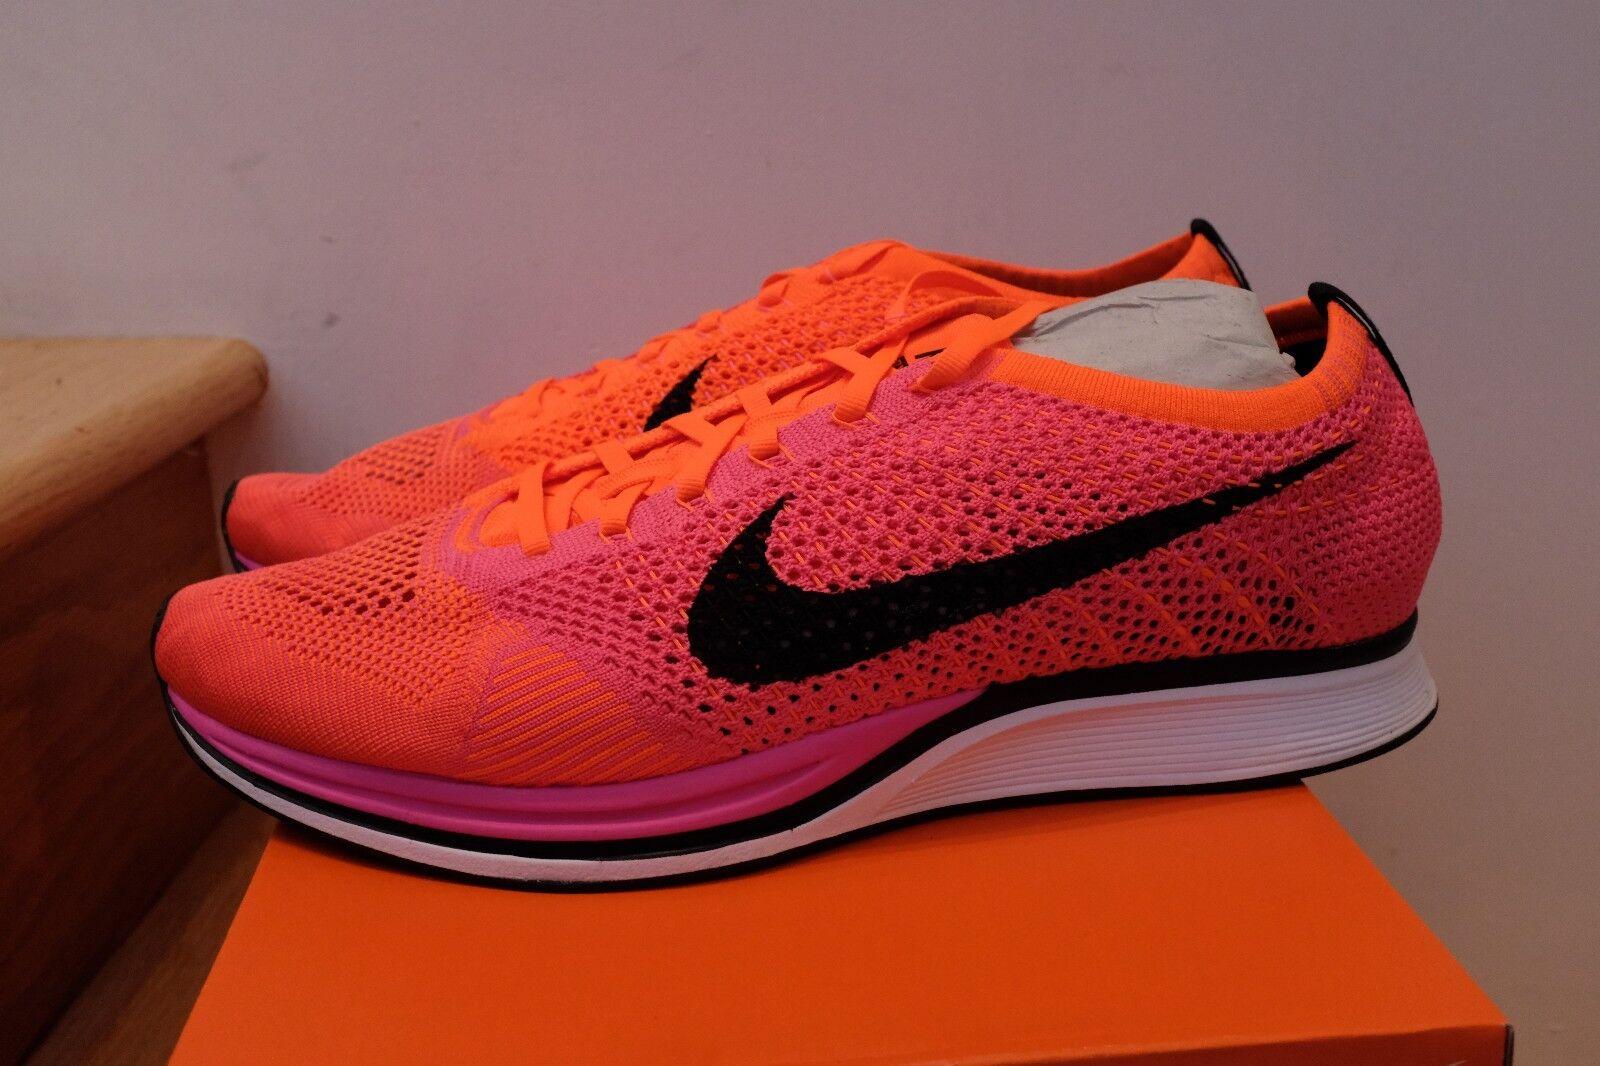 2014 Nike Flyknit Racer Pink Flash Crimson Crimson Crimson White Black size 13 c0ea1c